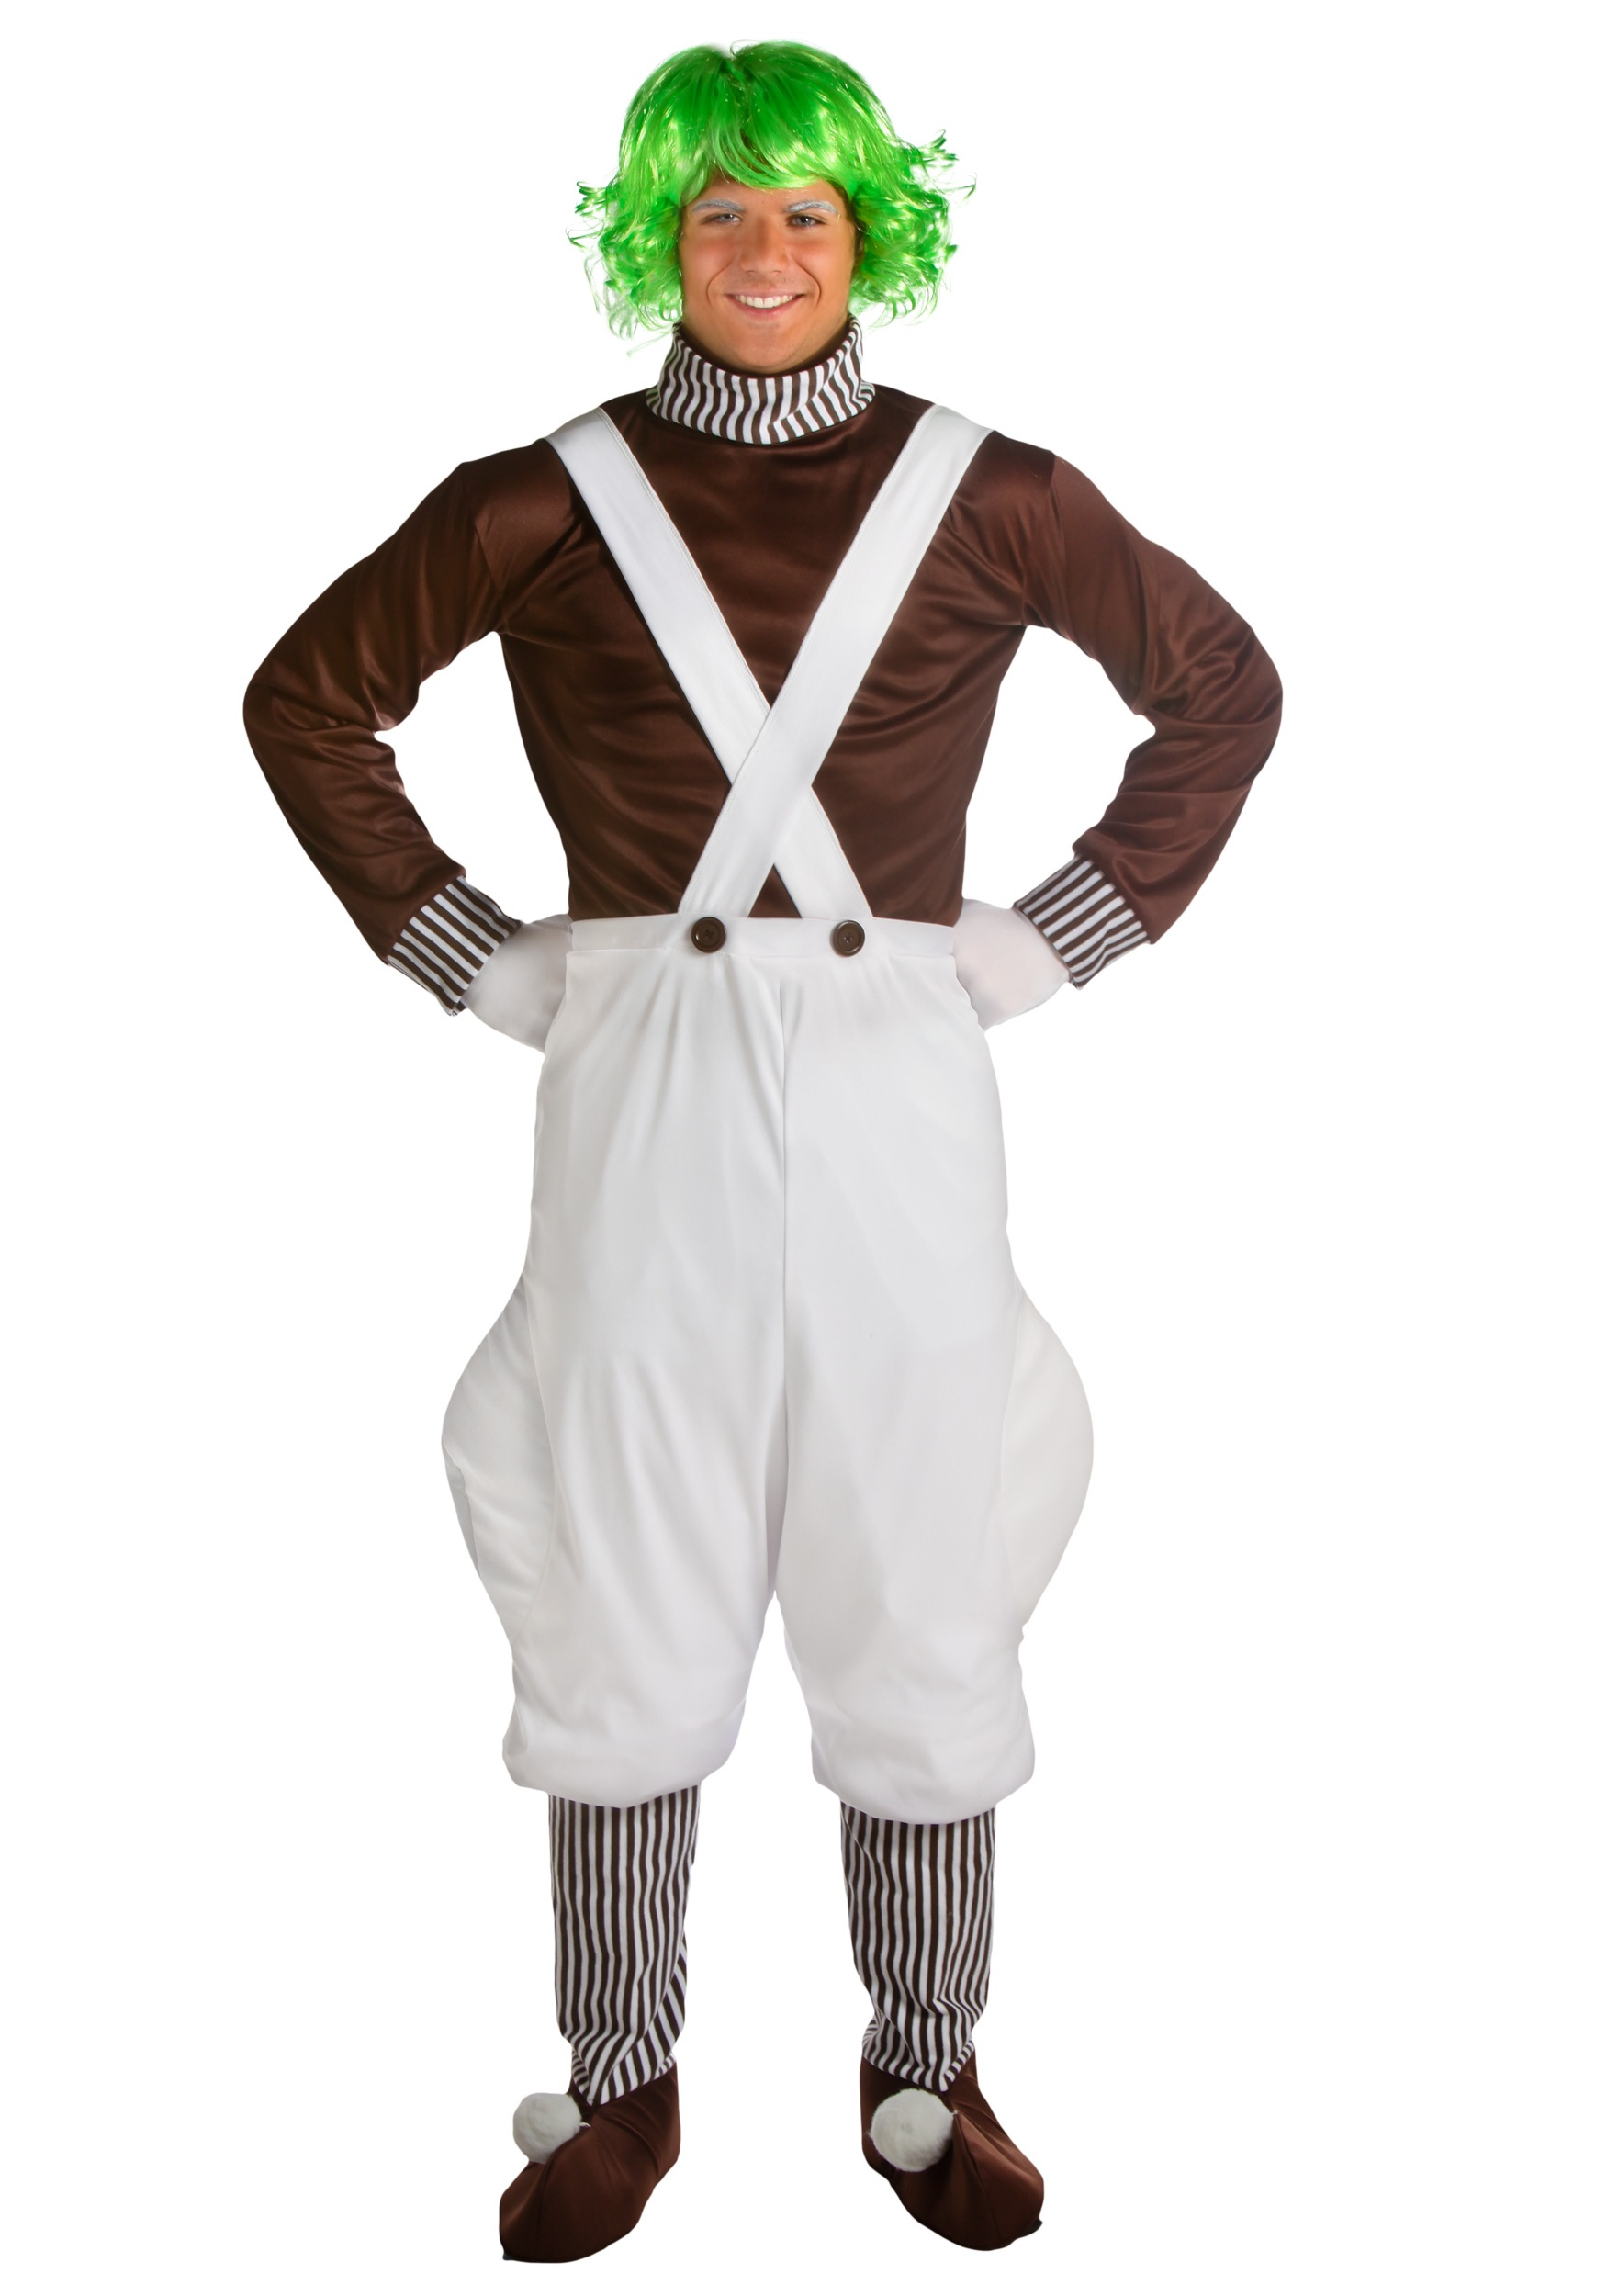 Elf Wig Green Oompa Loompa Willy Wonka Fancy Dress Halloween Costume Accessory